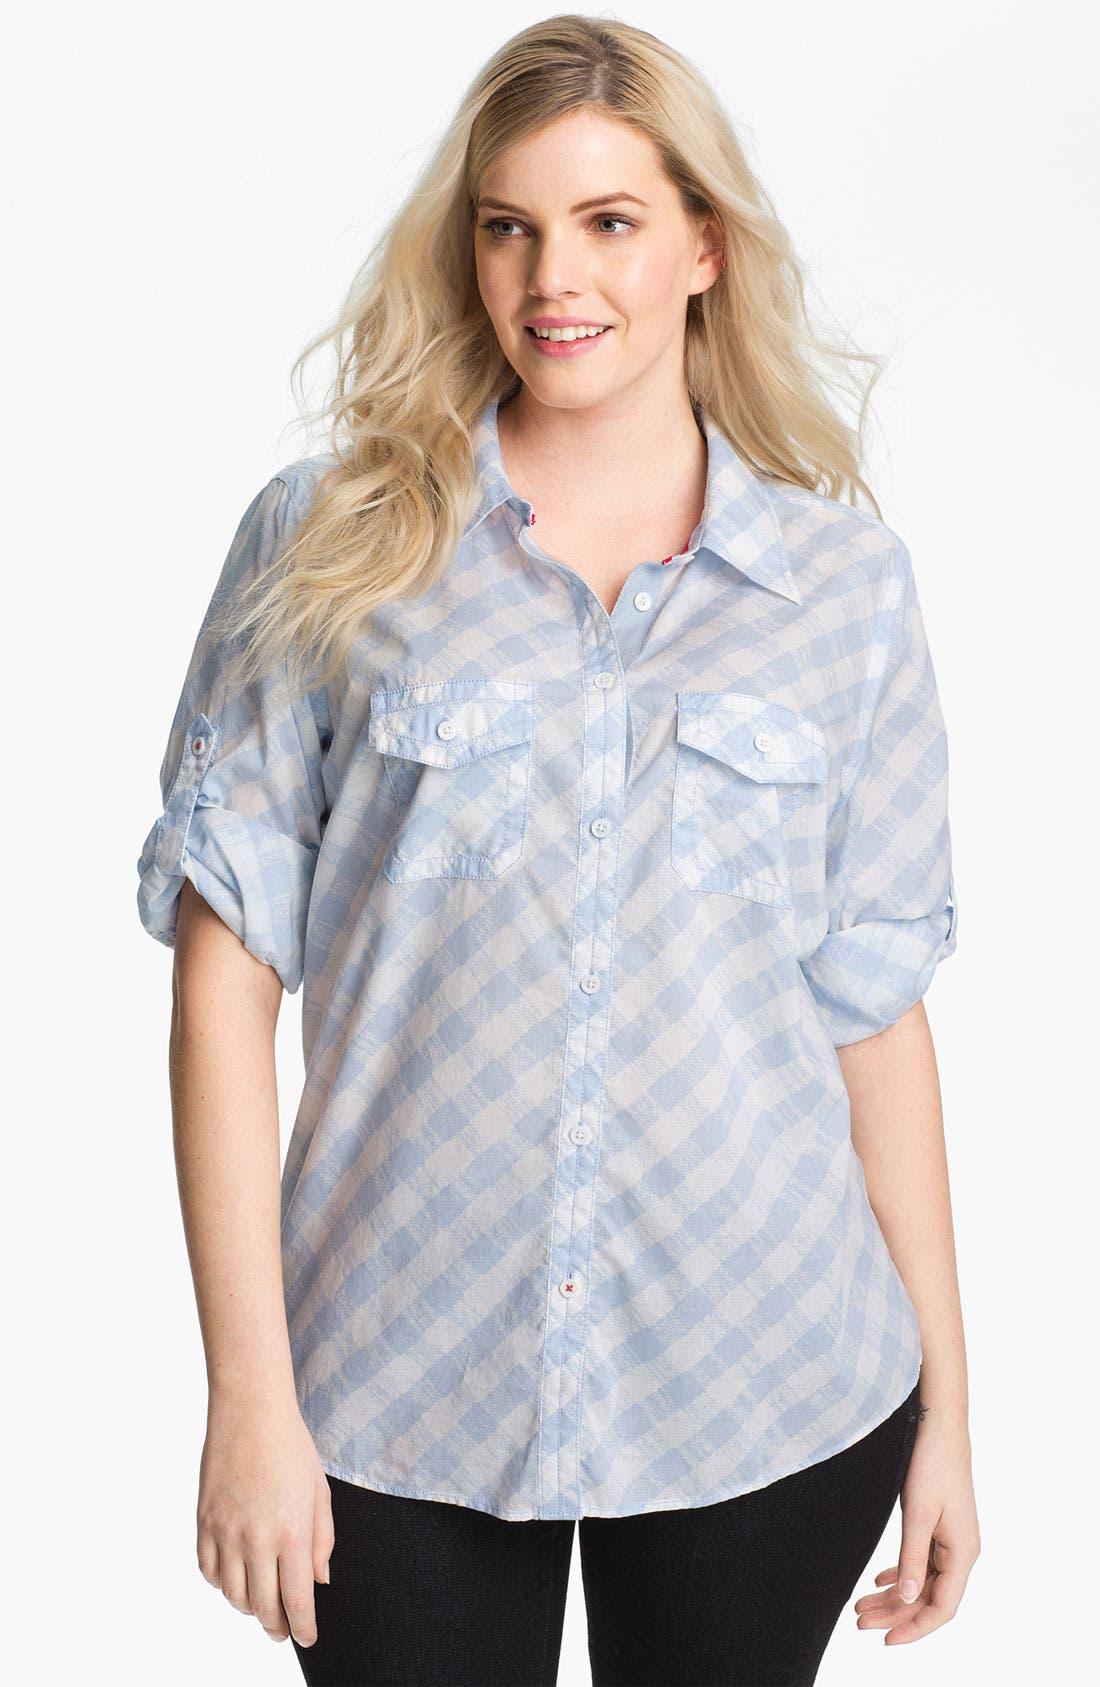 Alternate Image 1 Selected - Shirt 469 'Picnic Plaid' Cotton Shirt (Plus)